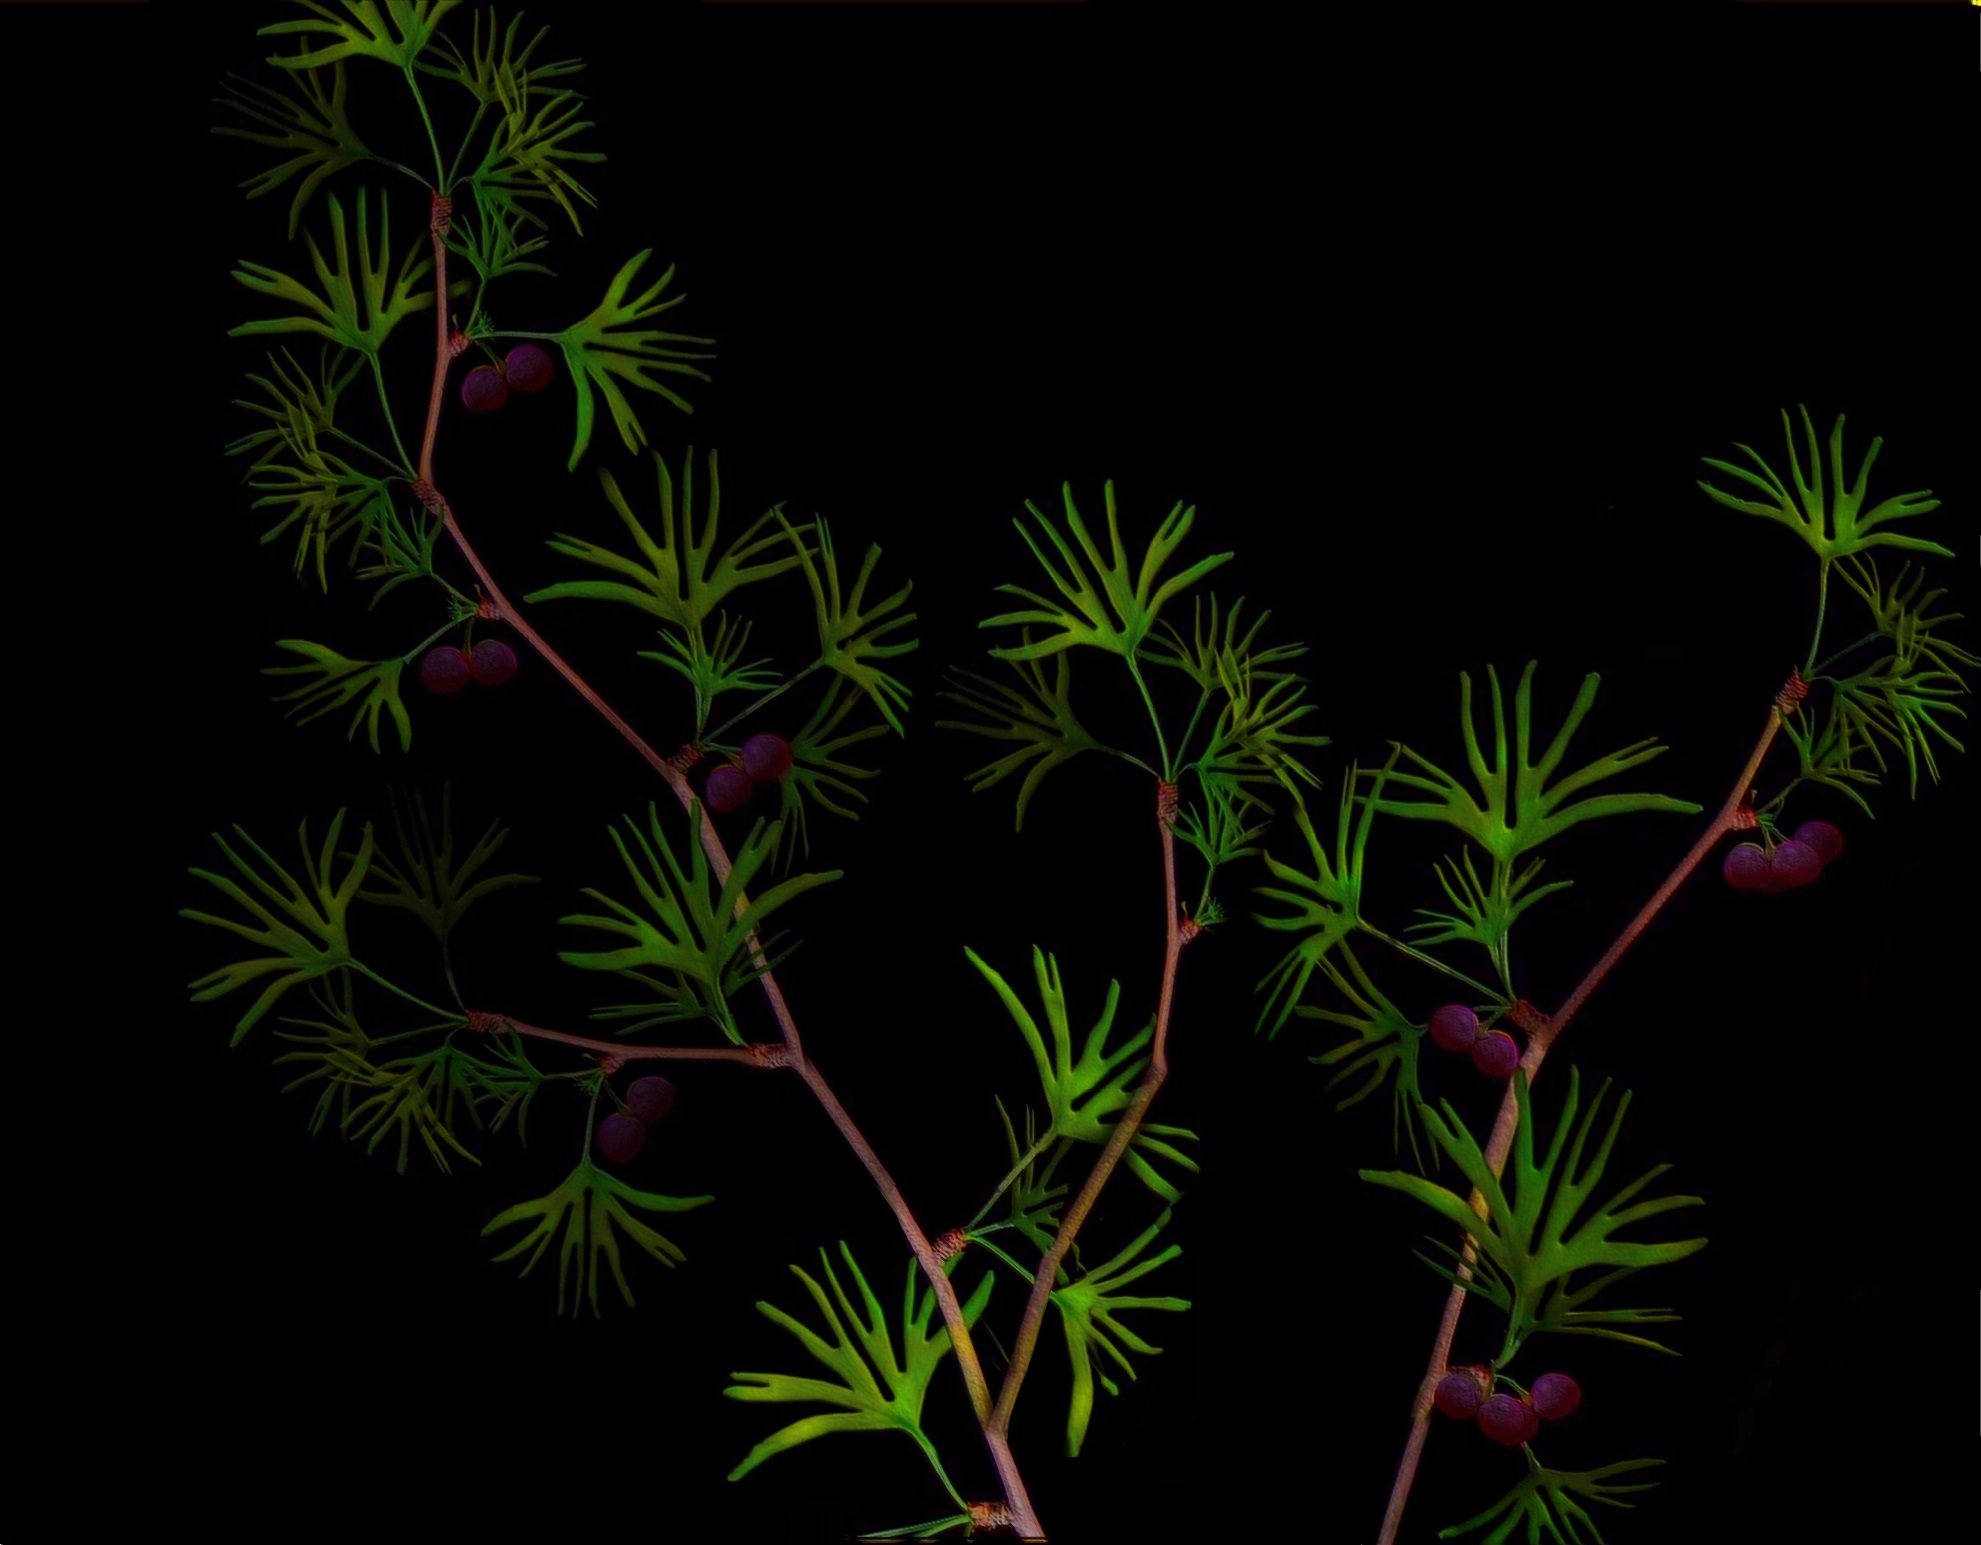 Depiction of Ginkgoaceae